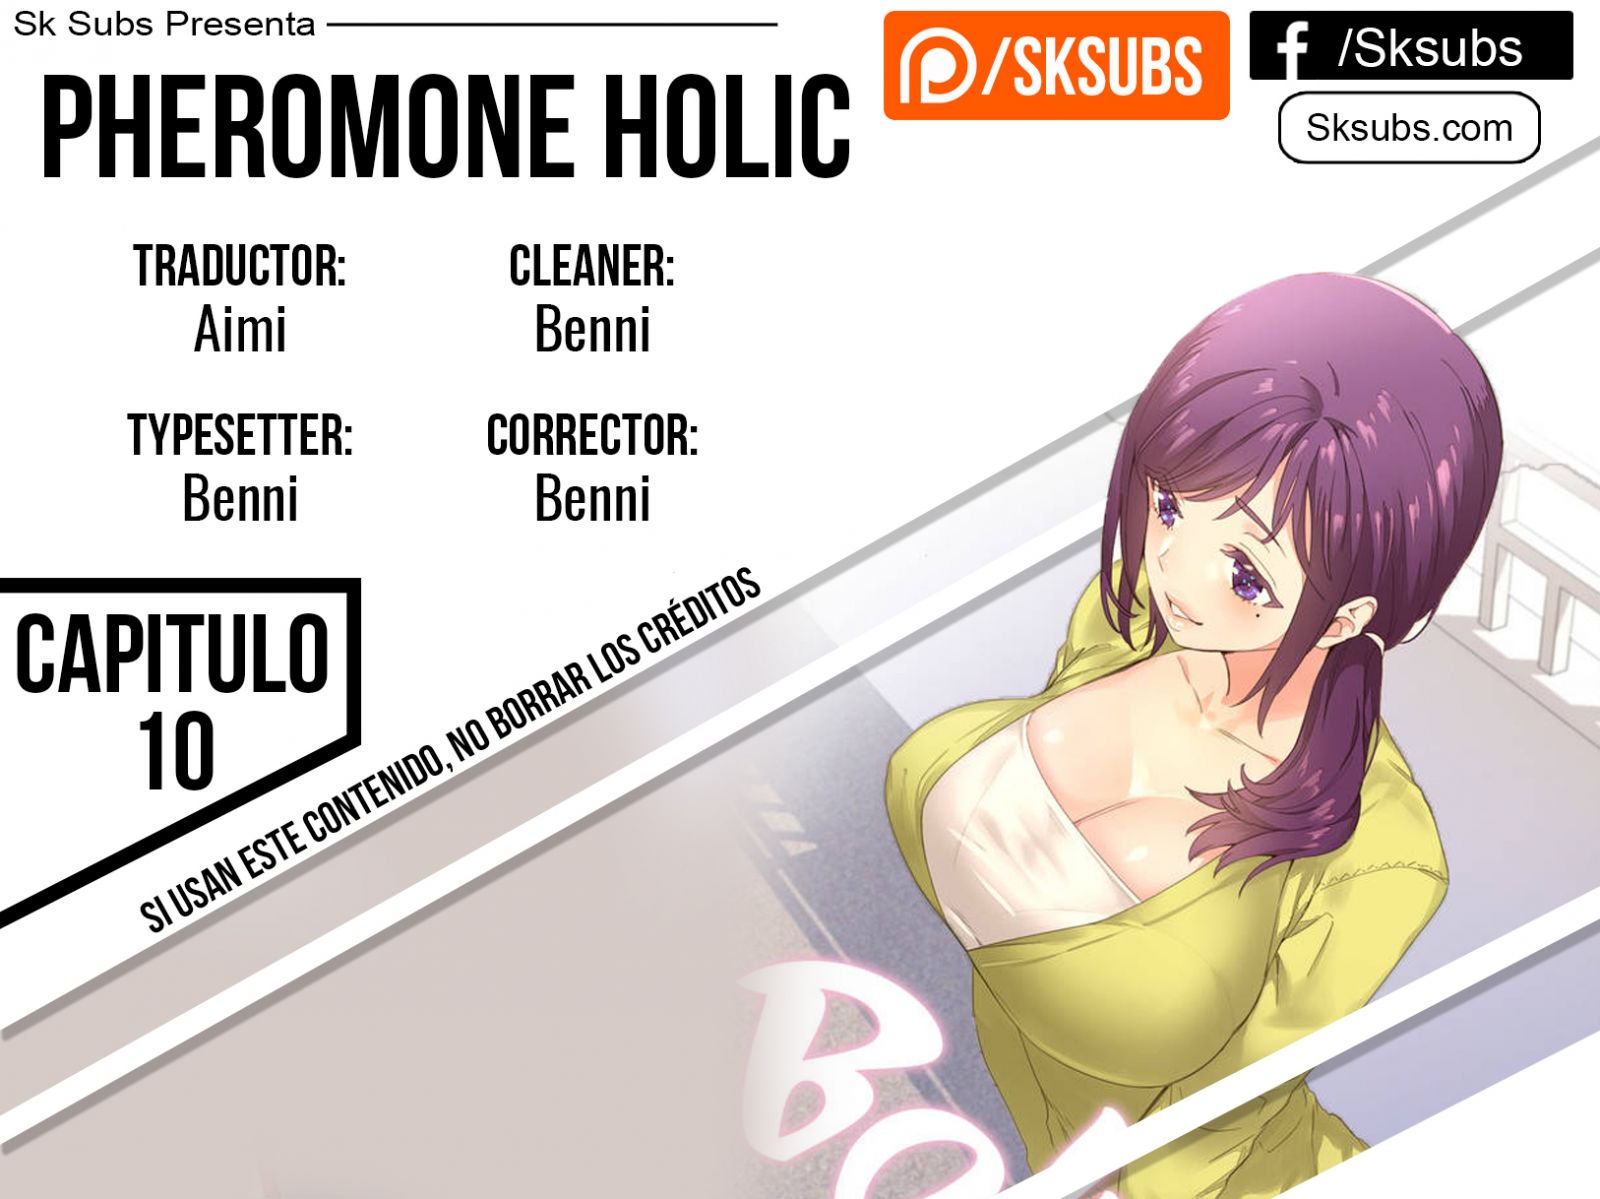 https://c9.mangatag.com/es_manga/pic5/58/25146/635336/f8c57123a634f9f95e9bbe3734b14855.jpg Page 1